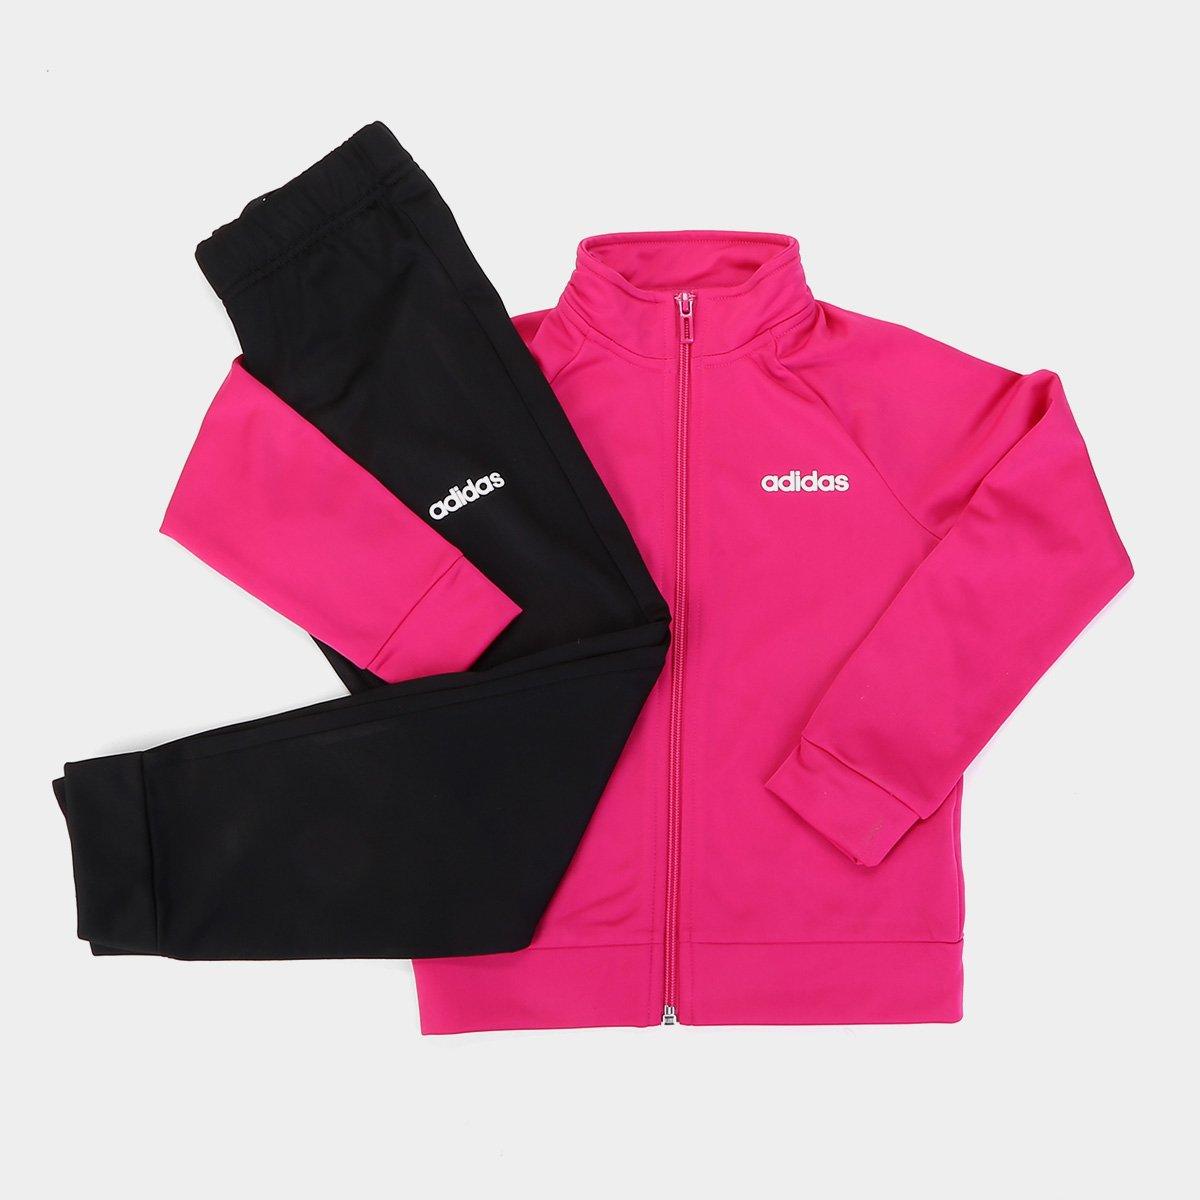 Jirafa Nueva llegada cisne  Agasalho Infantil Adidas YG Entry Feminino   Netshoes